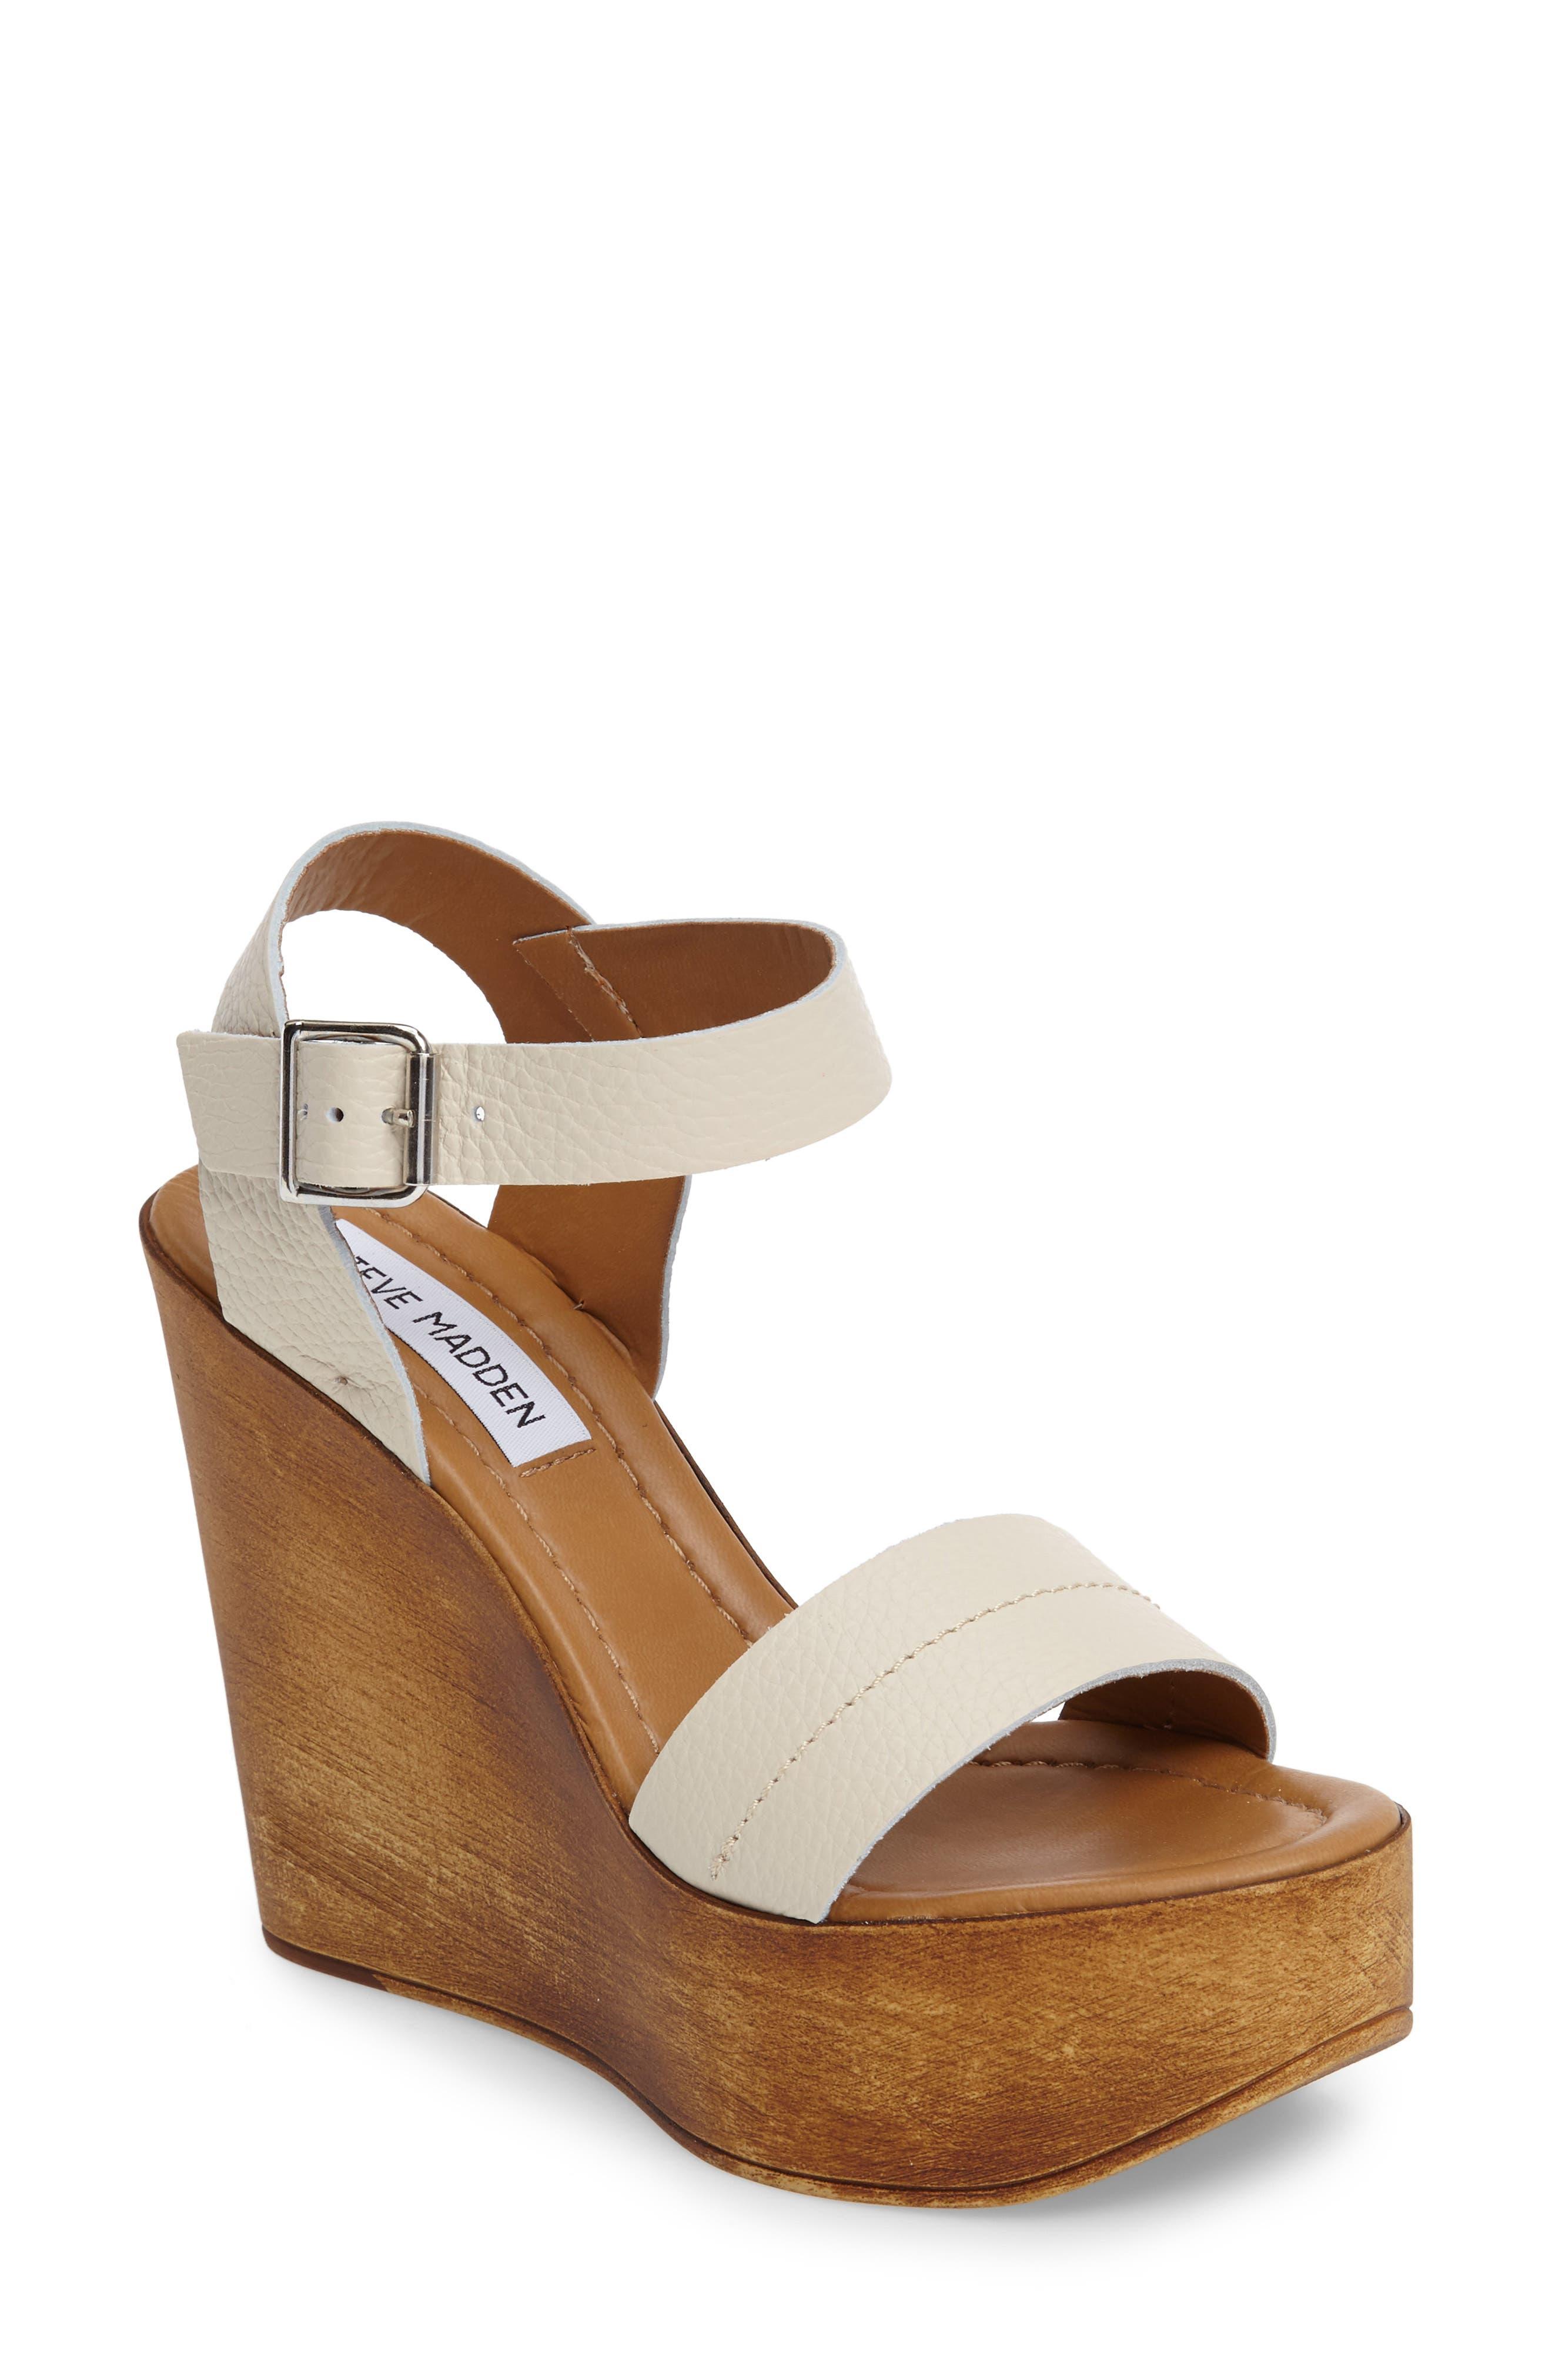 Belma Wedge Sandal,                             Main thumbnail 2, color,